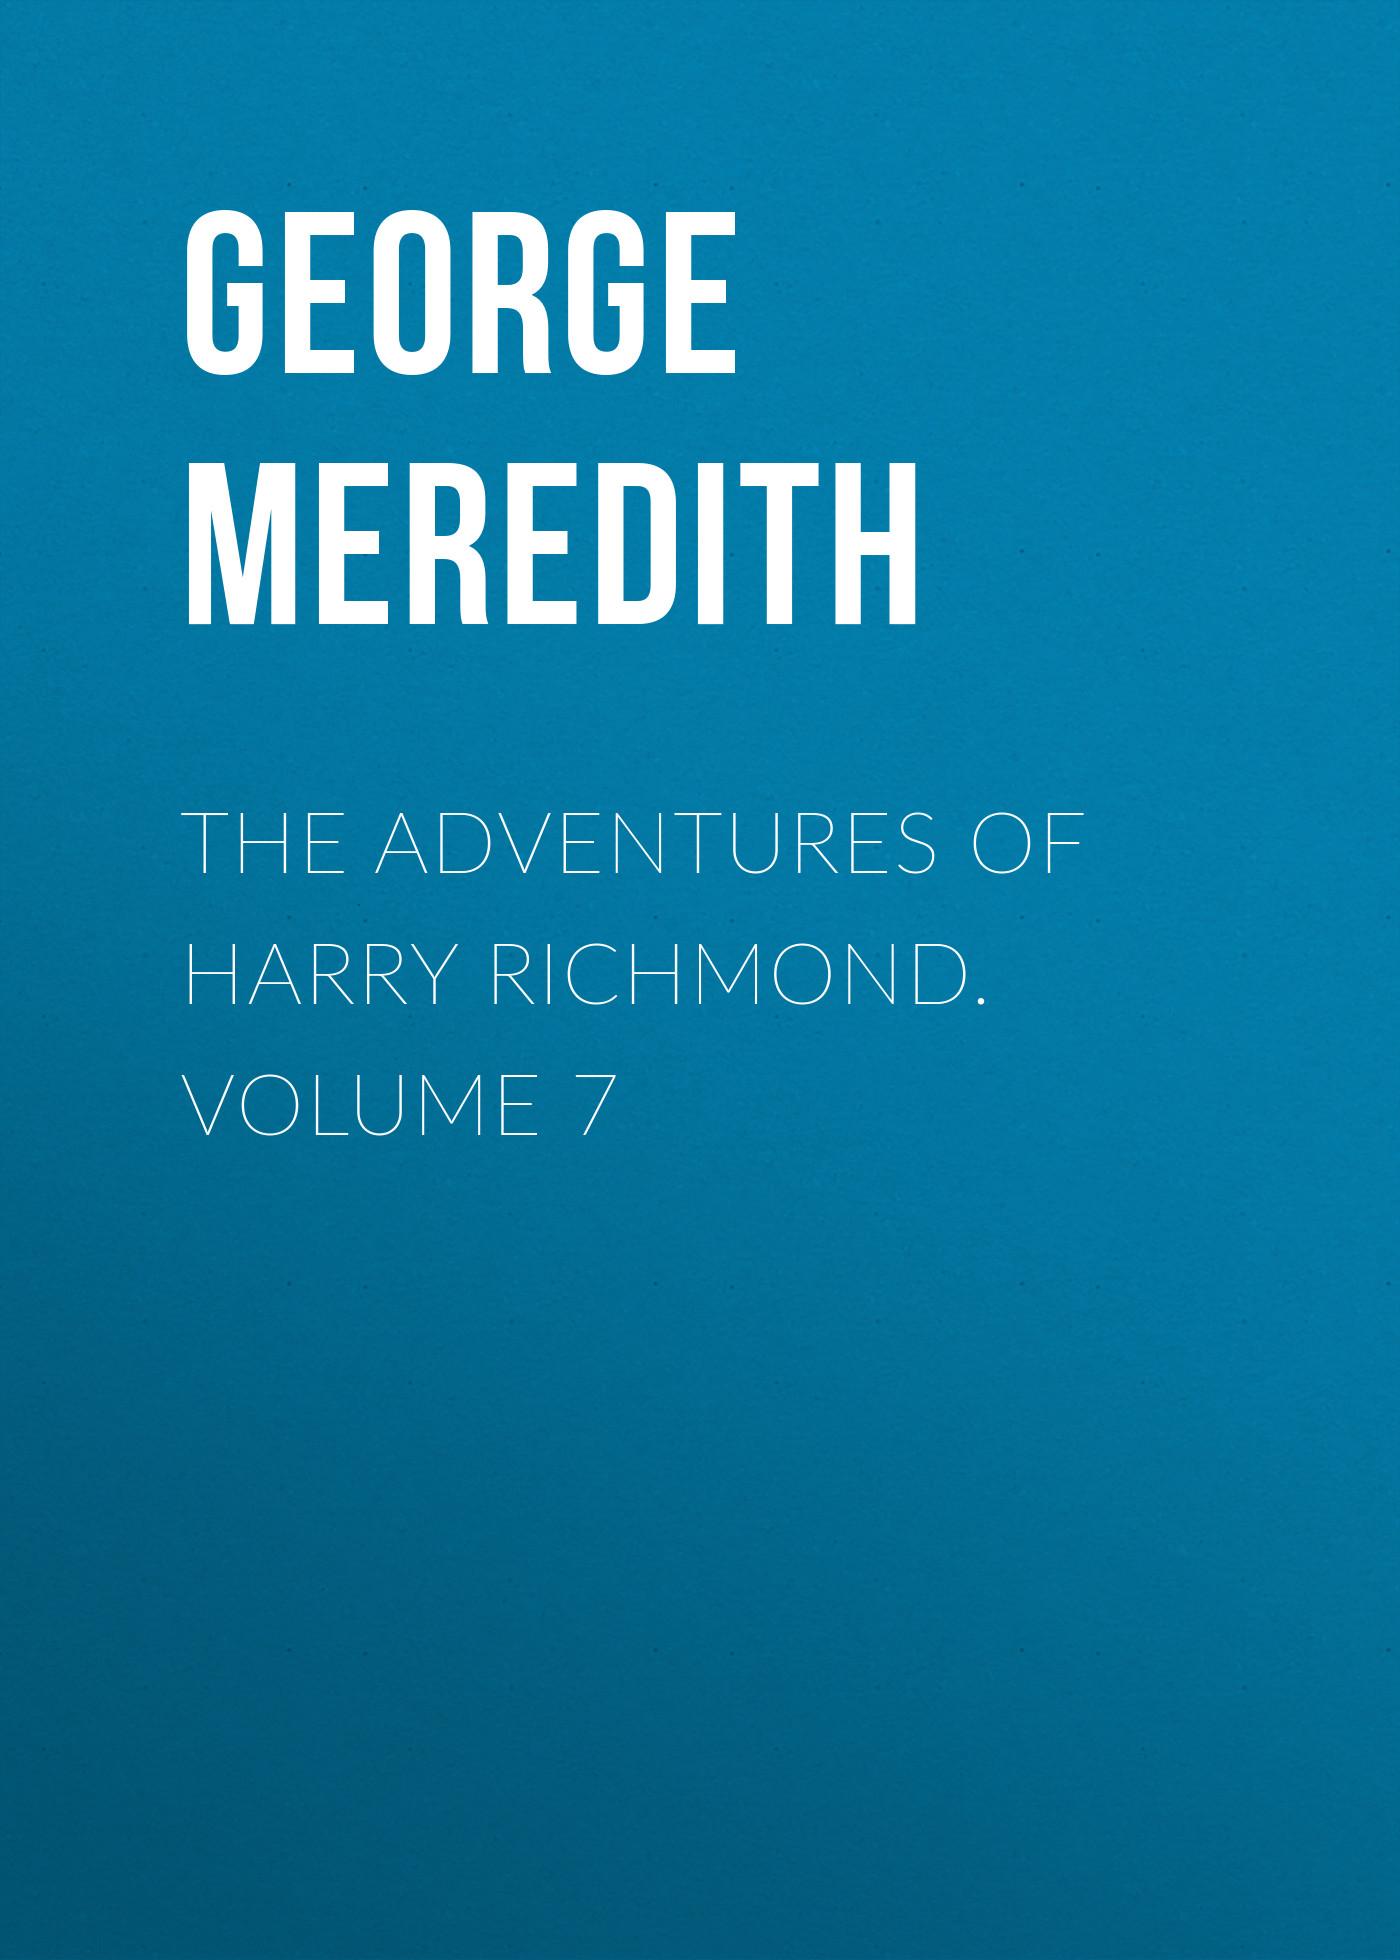 George Meredith The Adventures of Harry Richmond. Volume 7 sala george augustus the strange adventures of captain dangerous volume 1